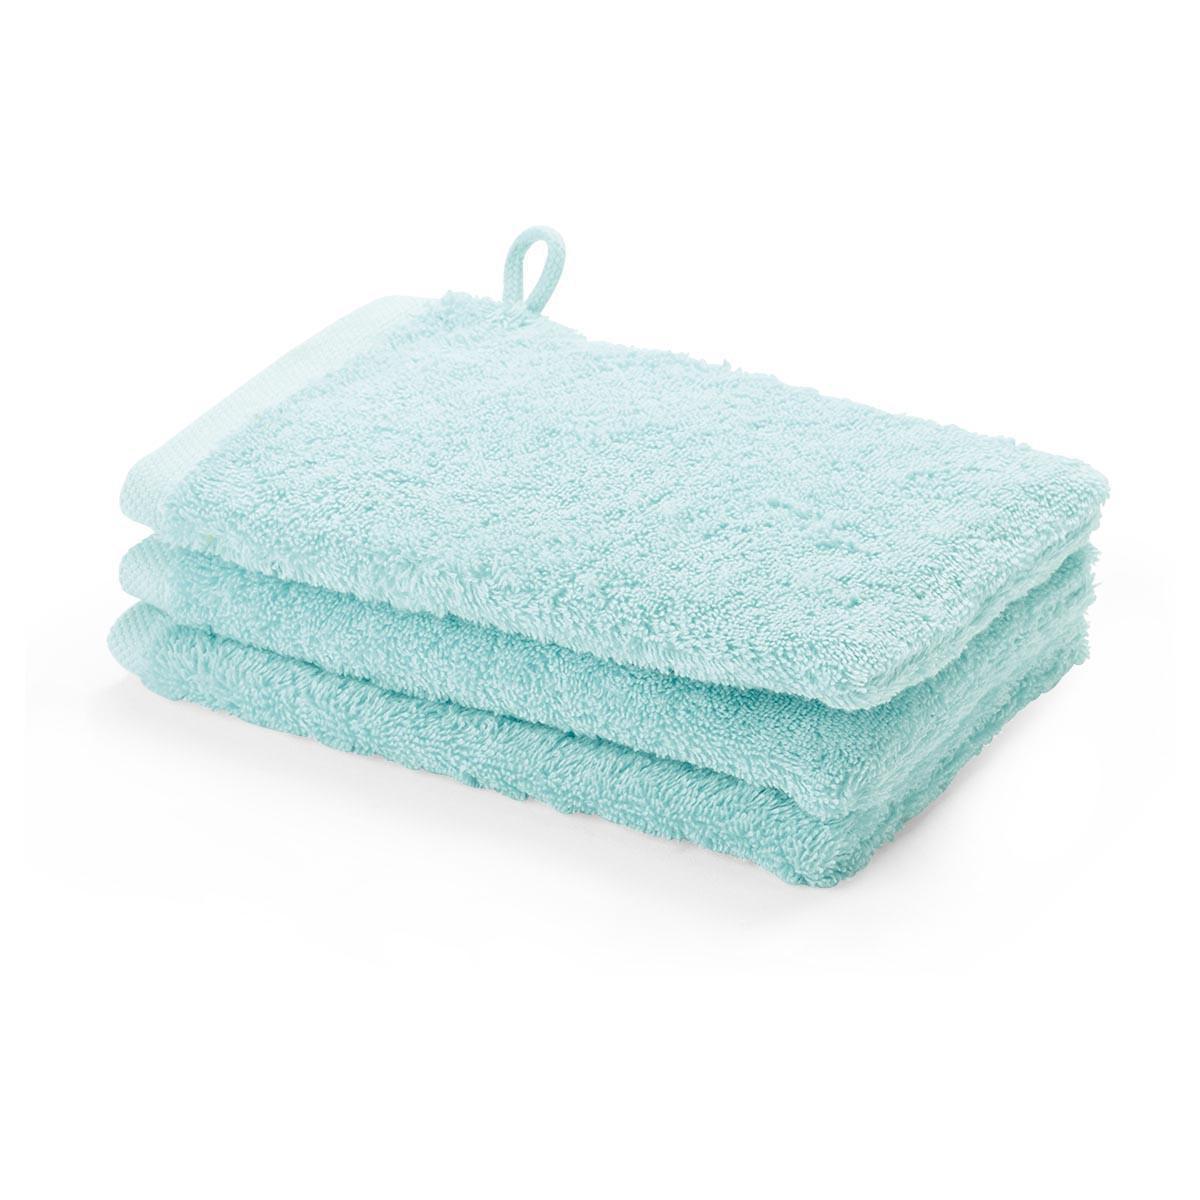 waschhandschuh 3er pack 16x22 london aquanova farbe mint. Black Bedroom Furniture Sets. Home Design Ideas